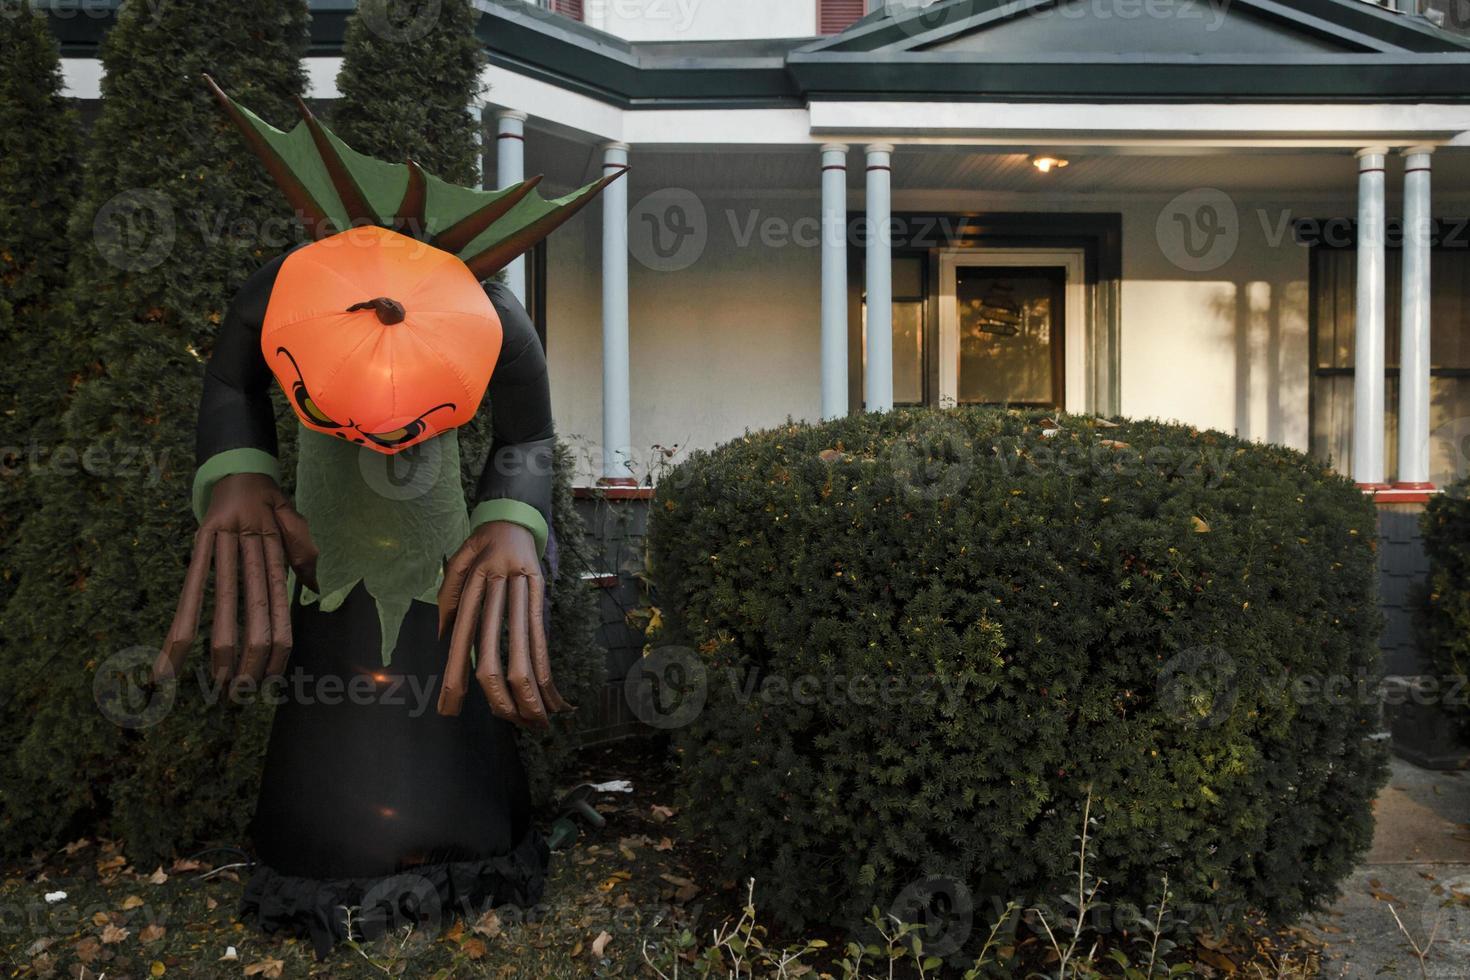 halloween dekoration på utsidan av huset foto